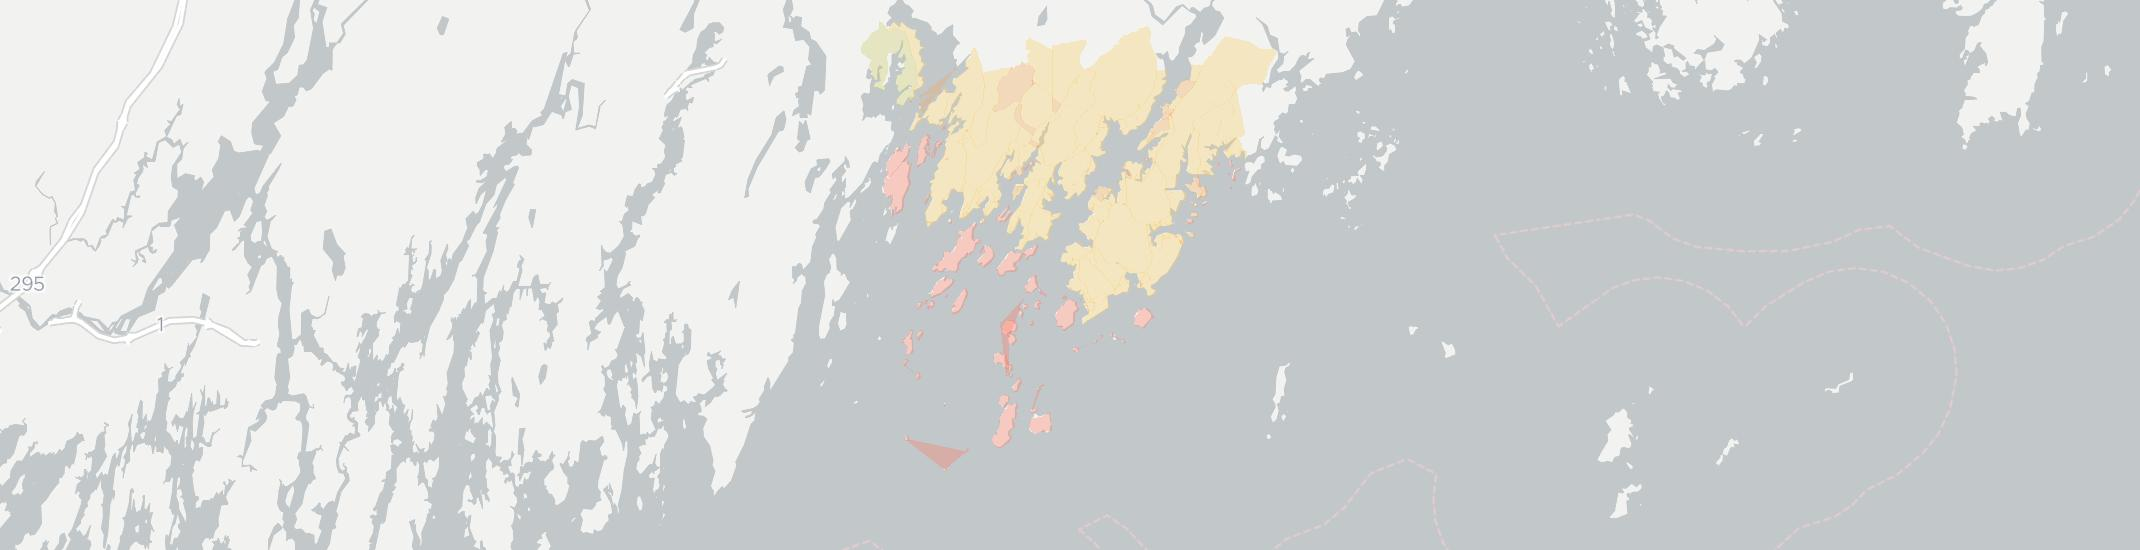 Tenants Harbor Maine Map.Tenants Harbor Me Has 8 Internet Service Providers From 29 95